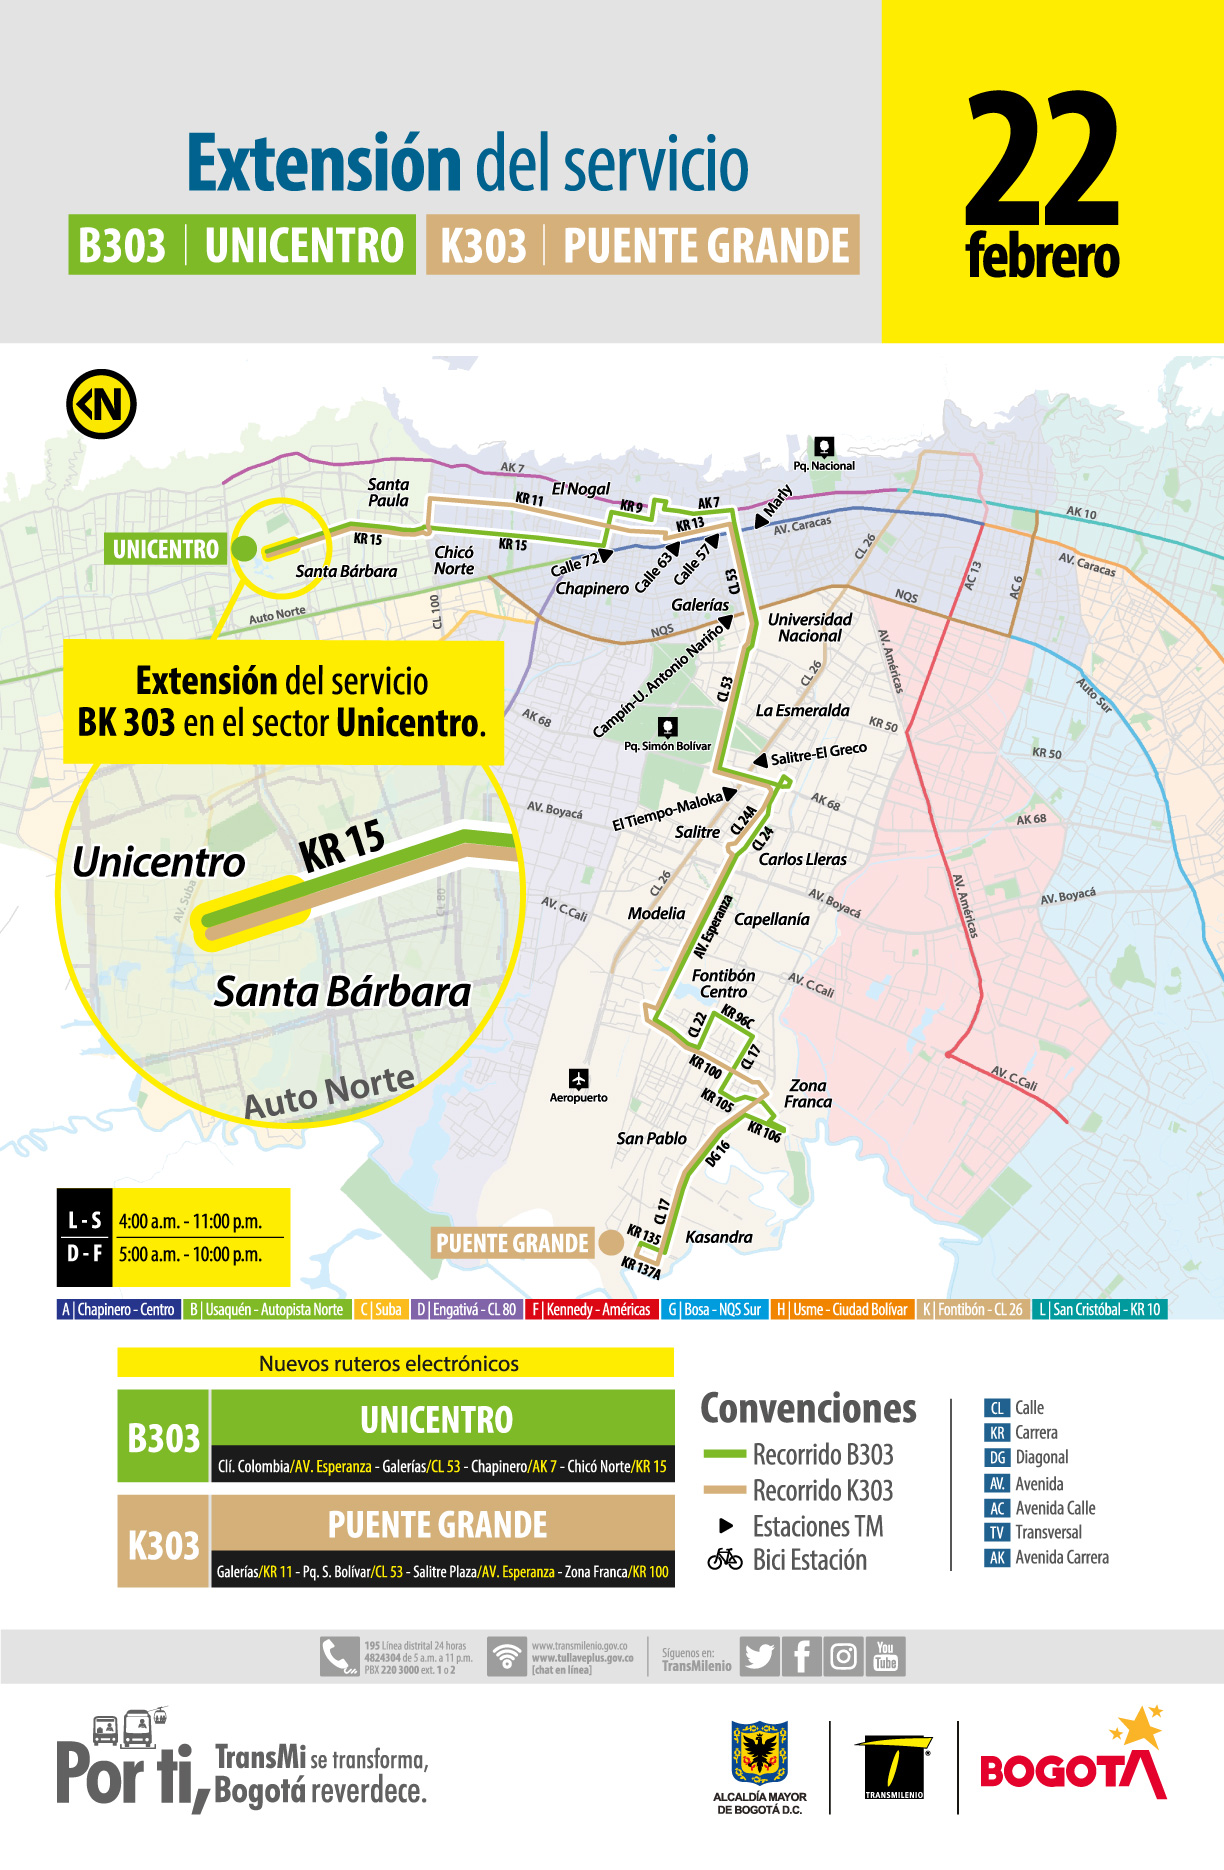 B303 Unicentro - K303 Puente Grande